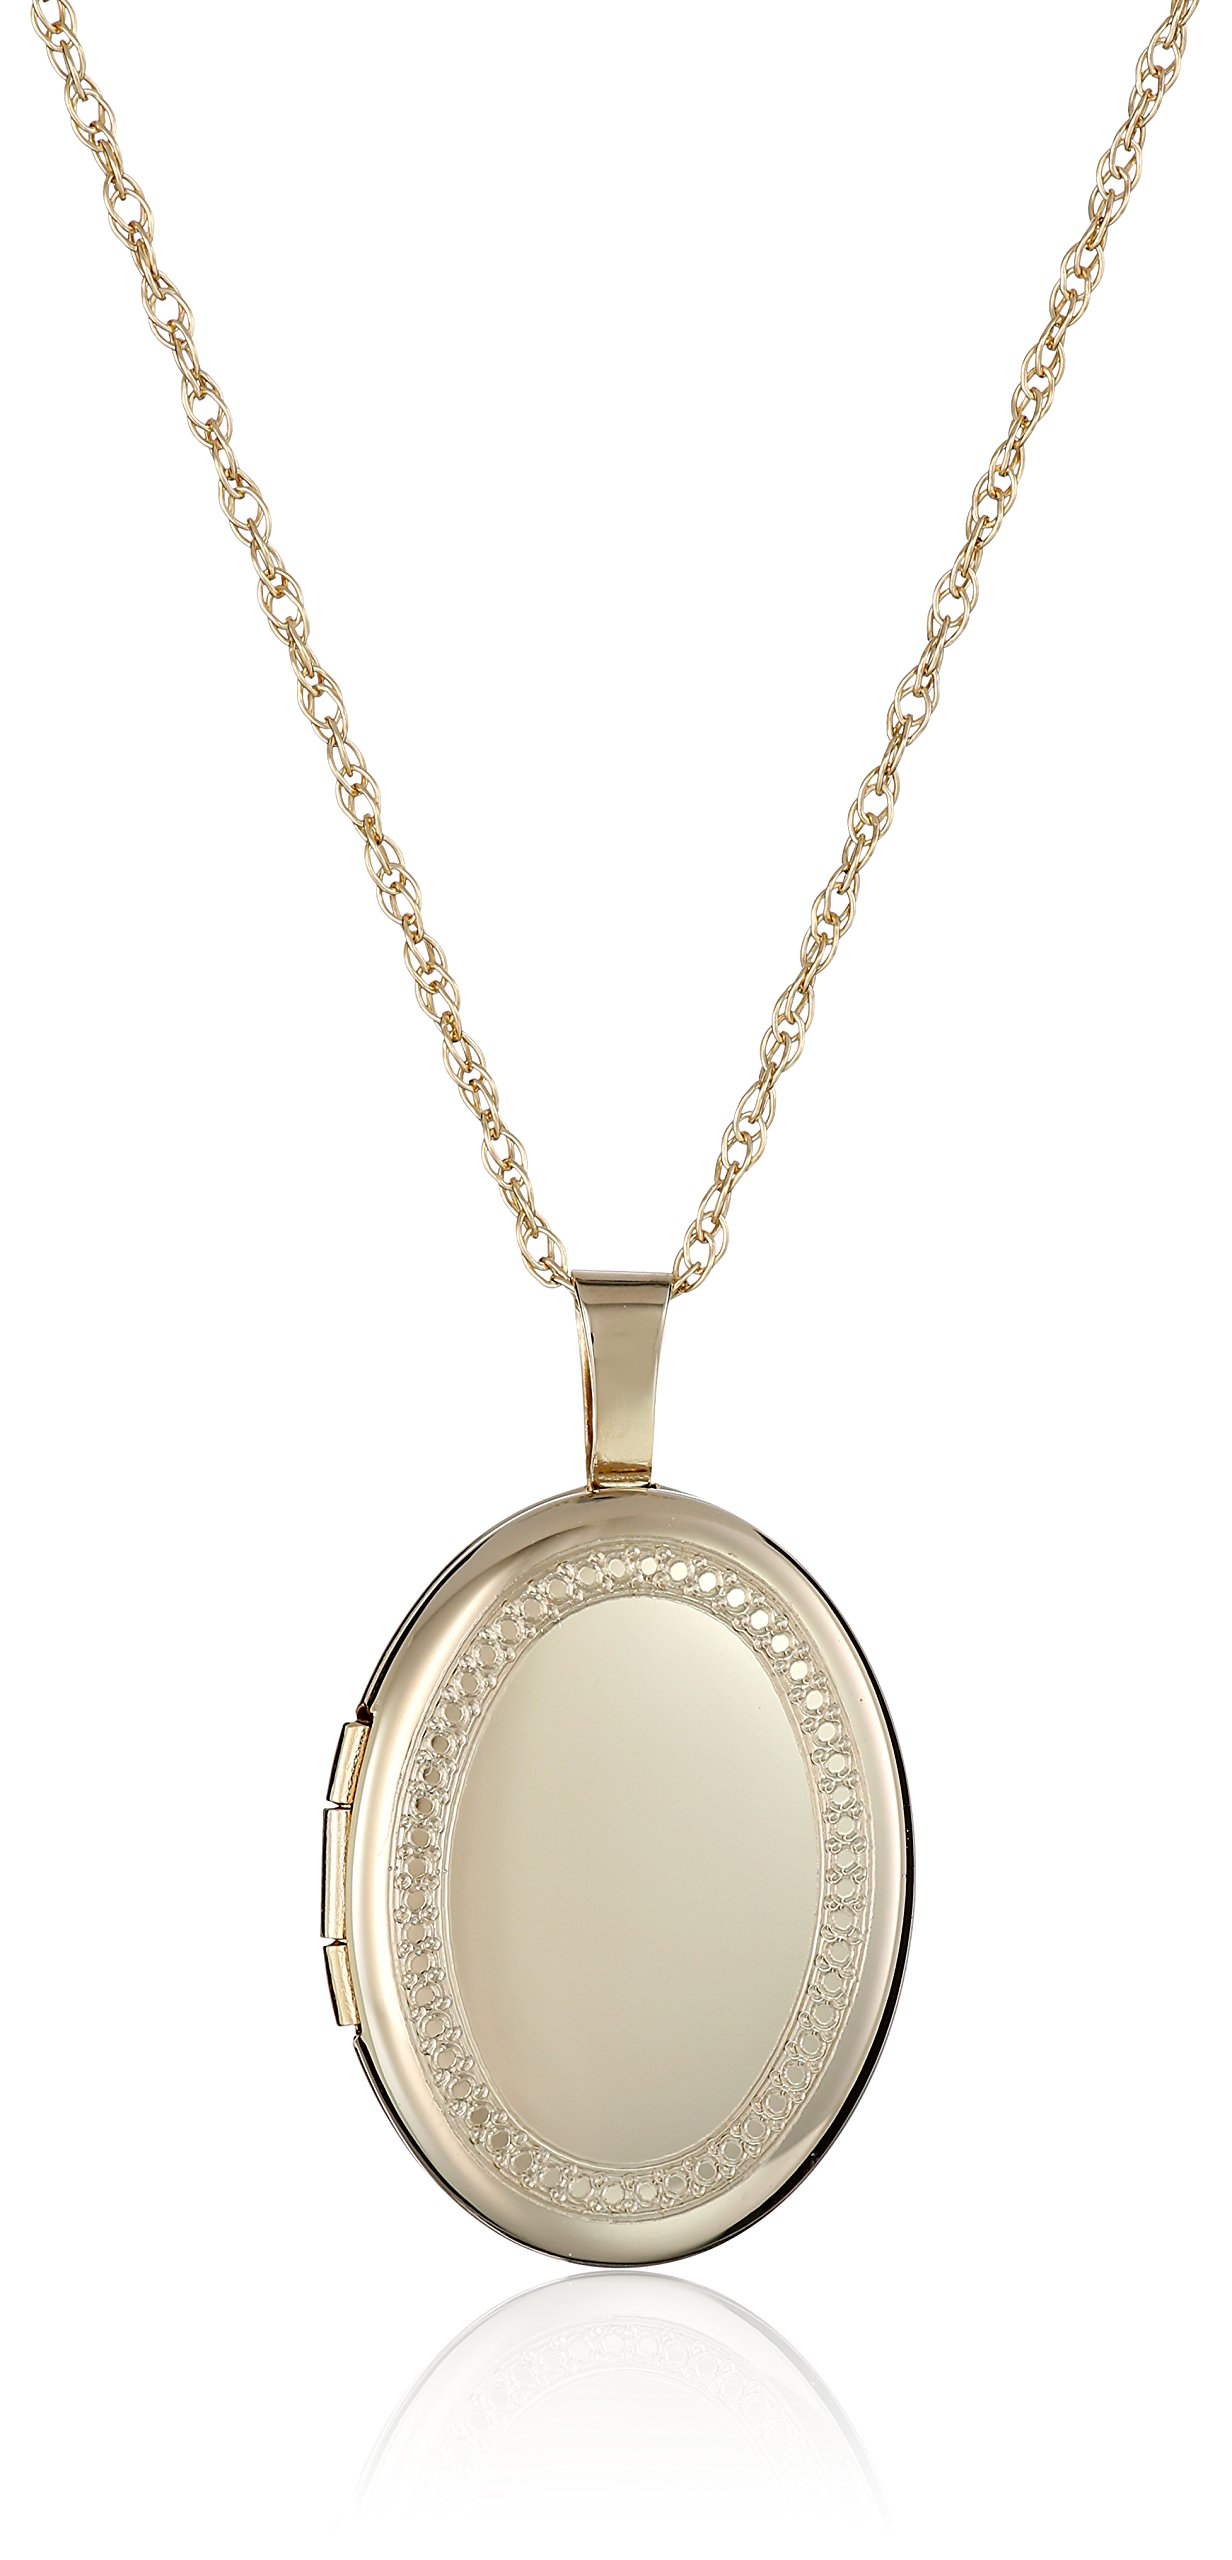 14k Gold-Filled Oval Milgrain Edge Locket Necklace, 18''